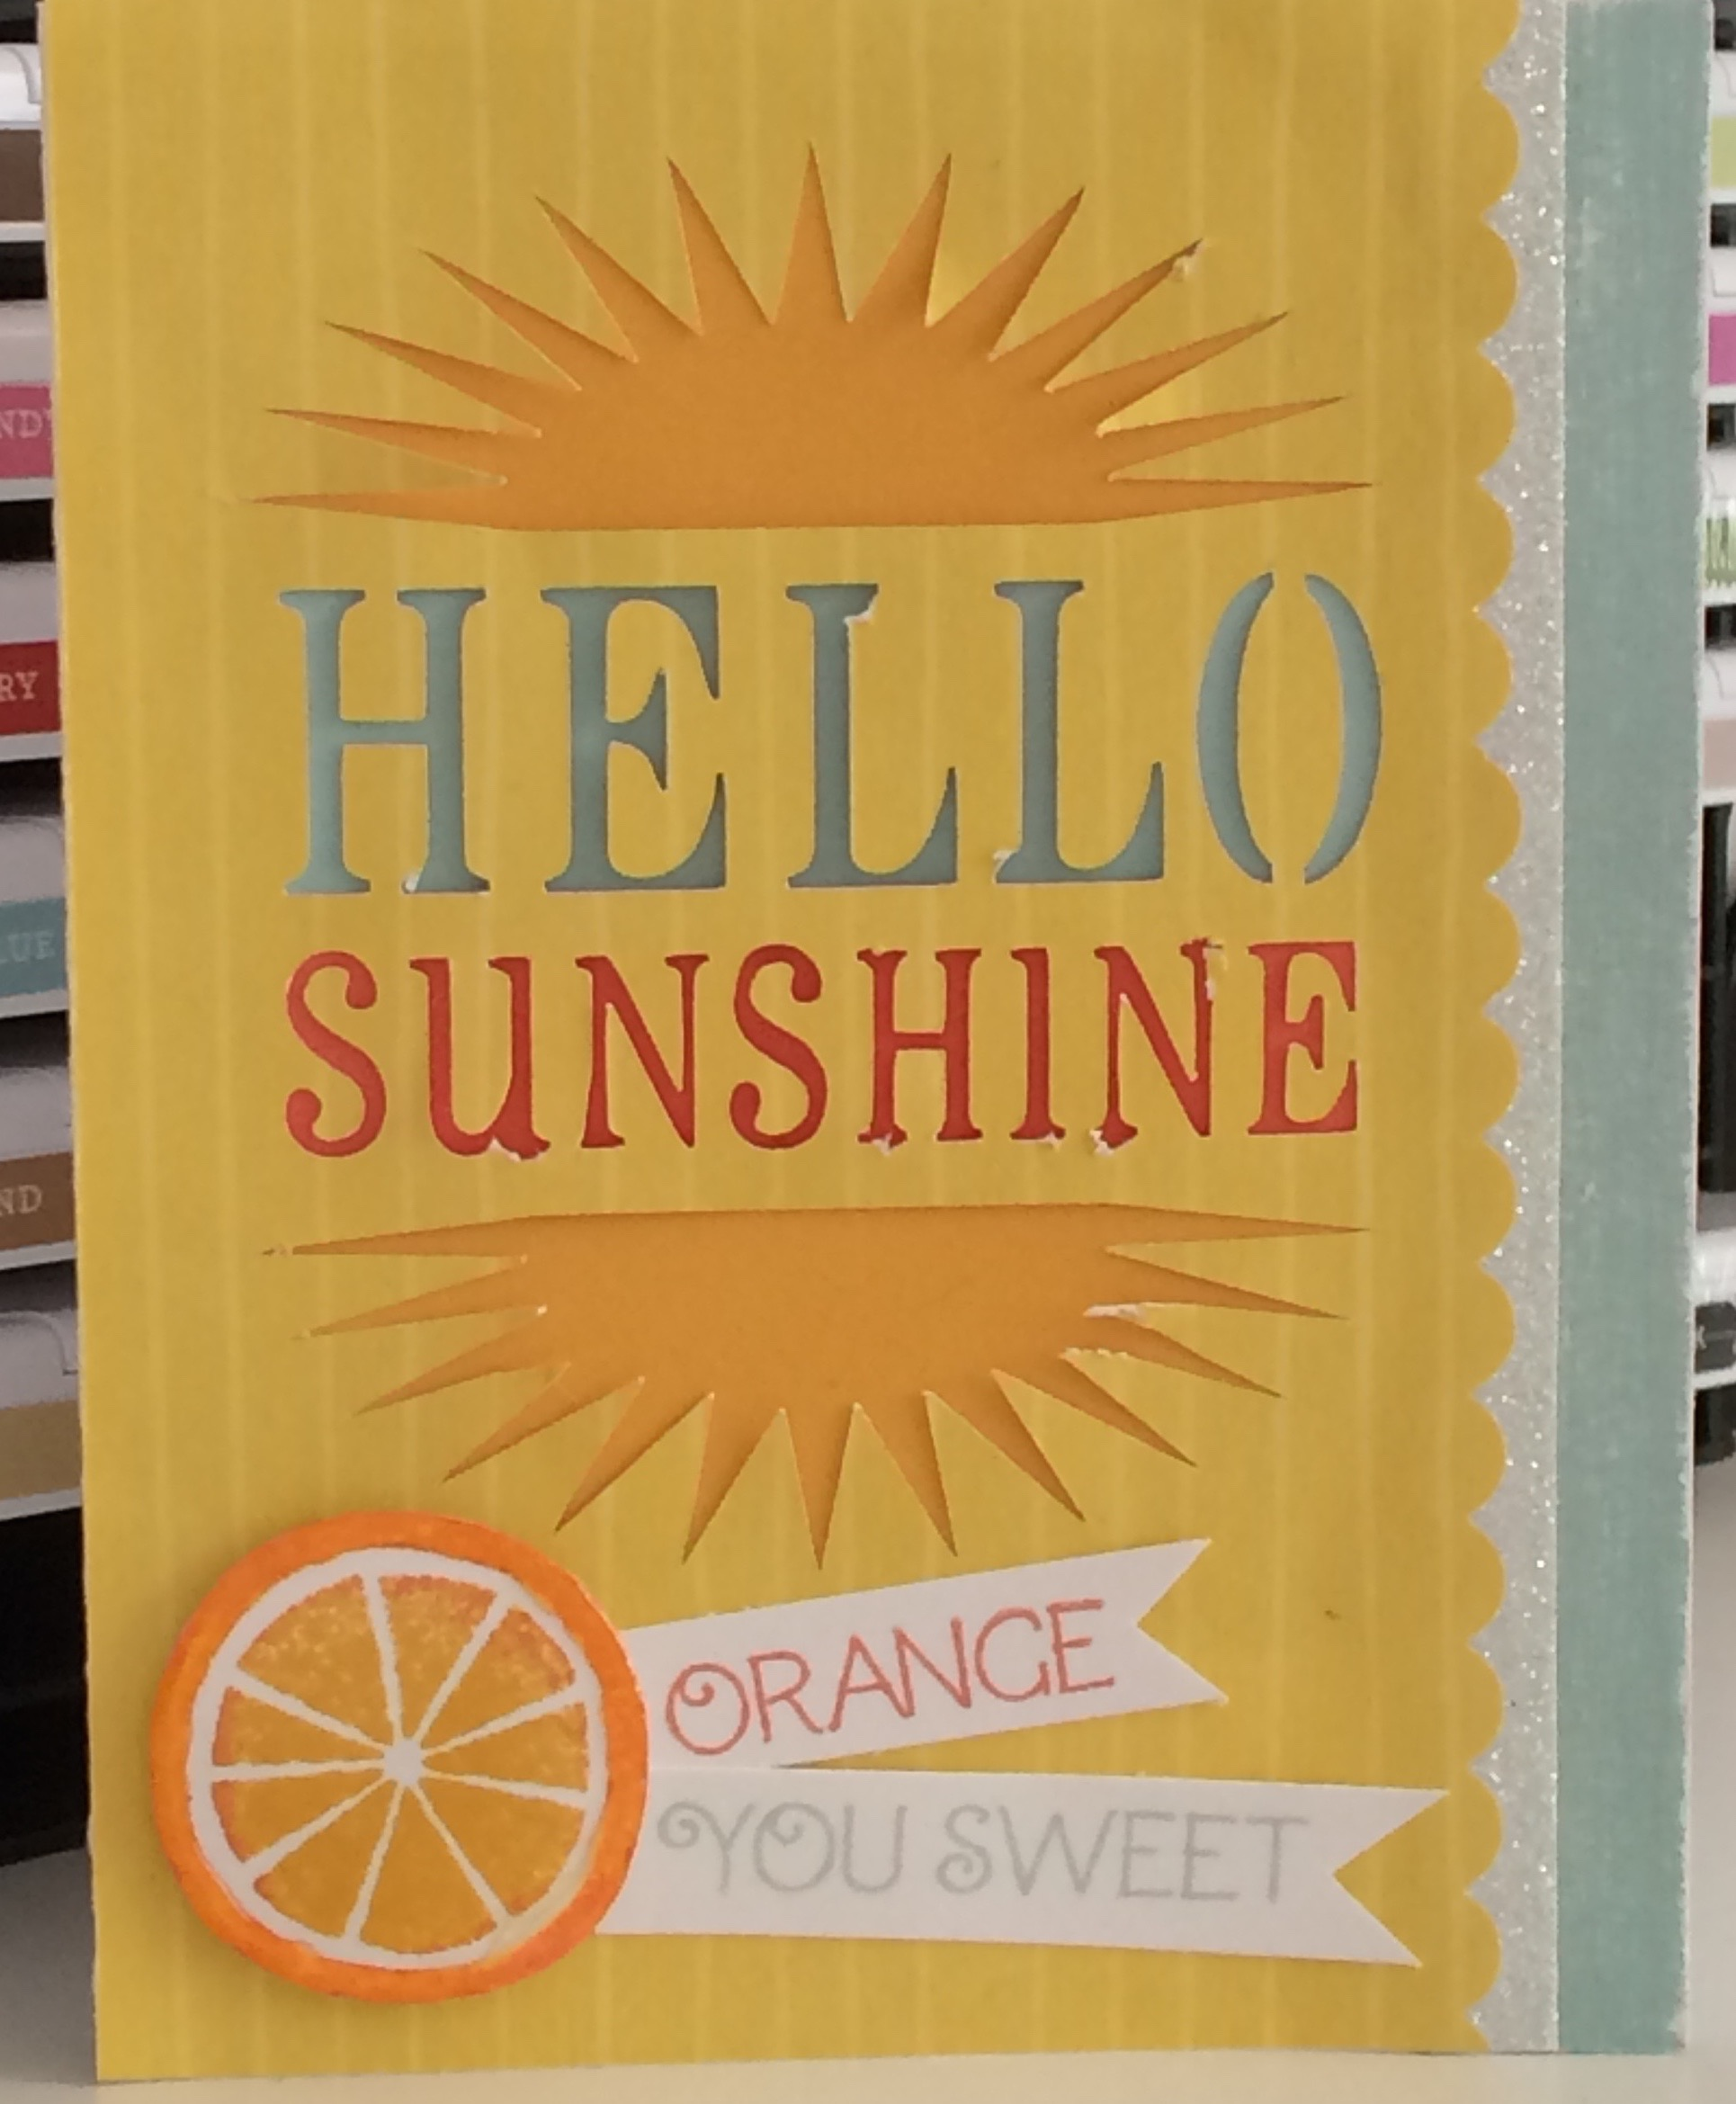 Hello Taste of Summer Sunshine